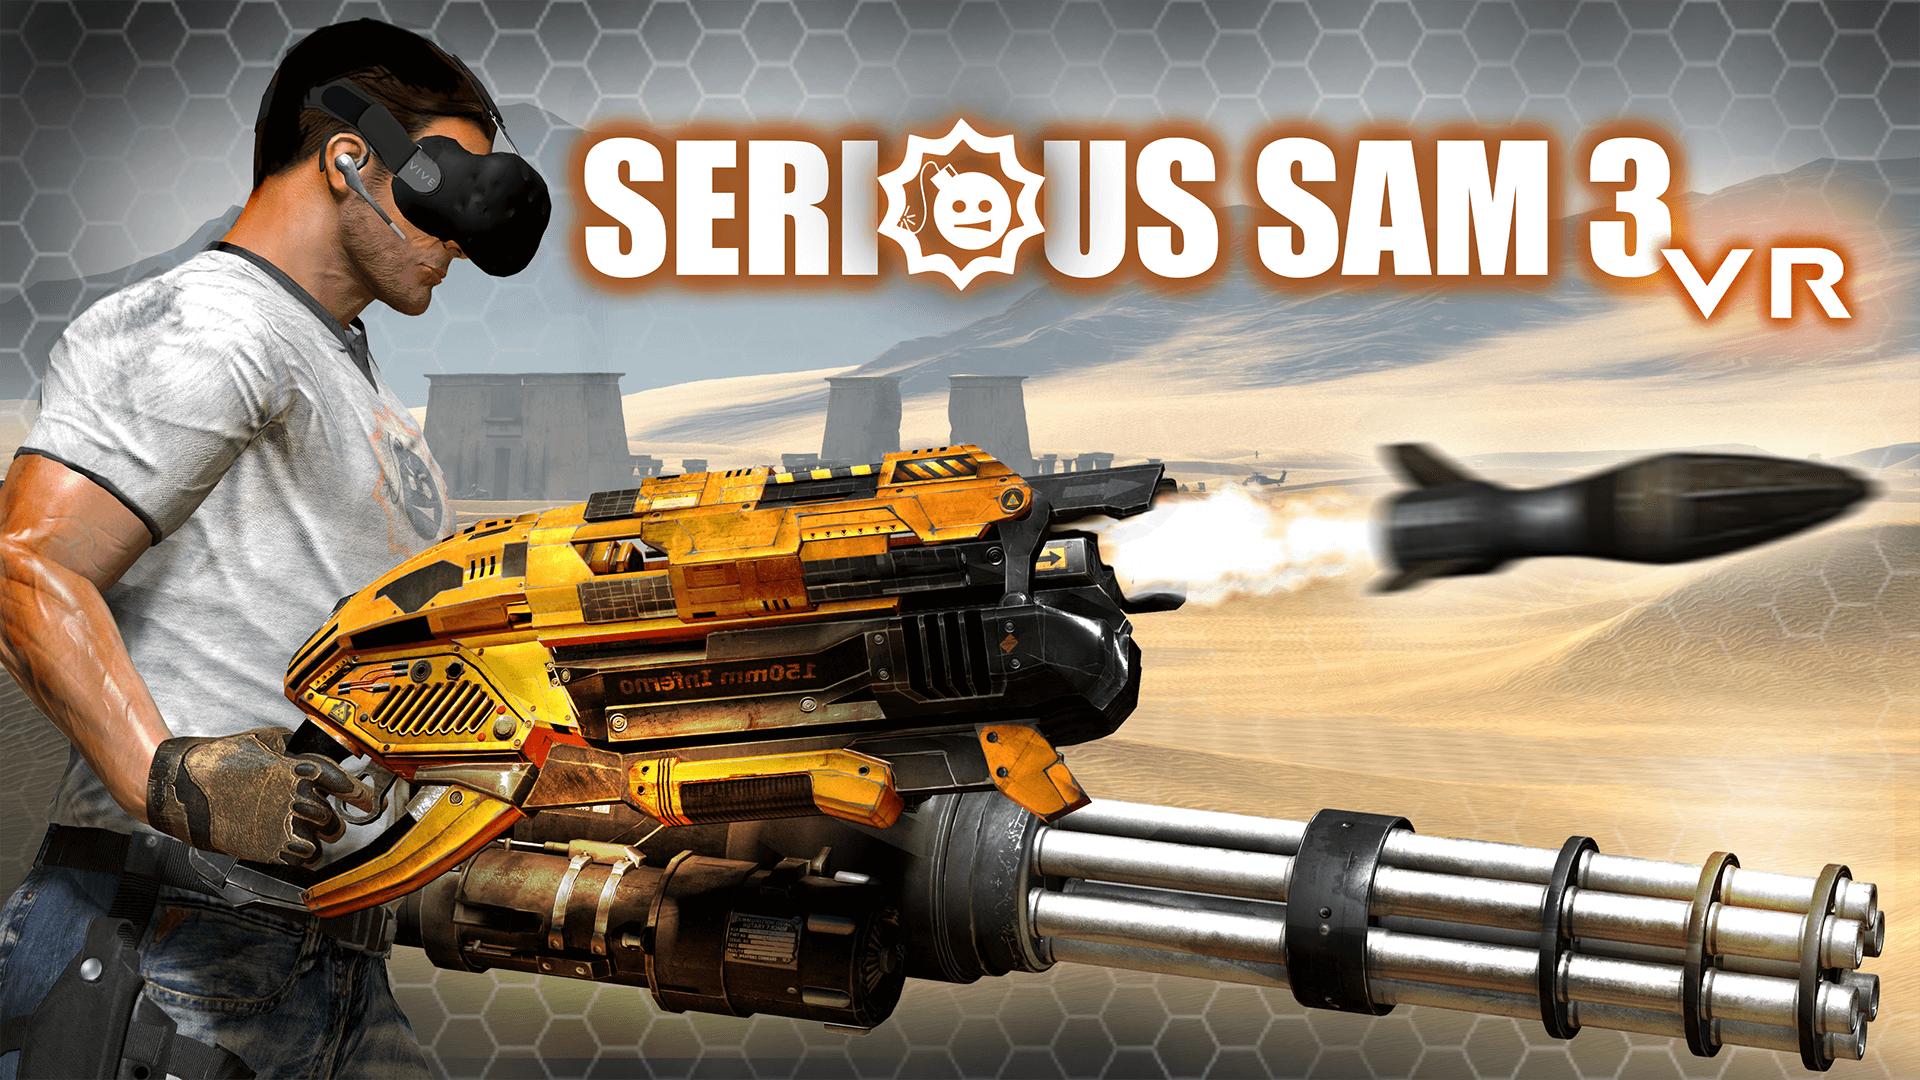 Serious Sam 3 VR